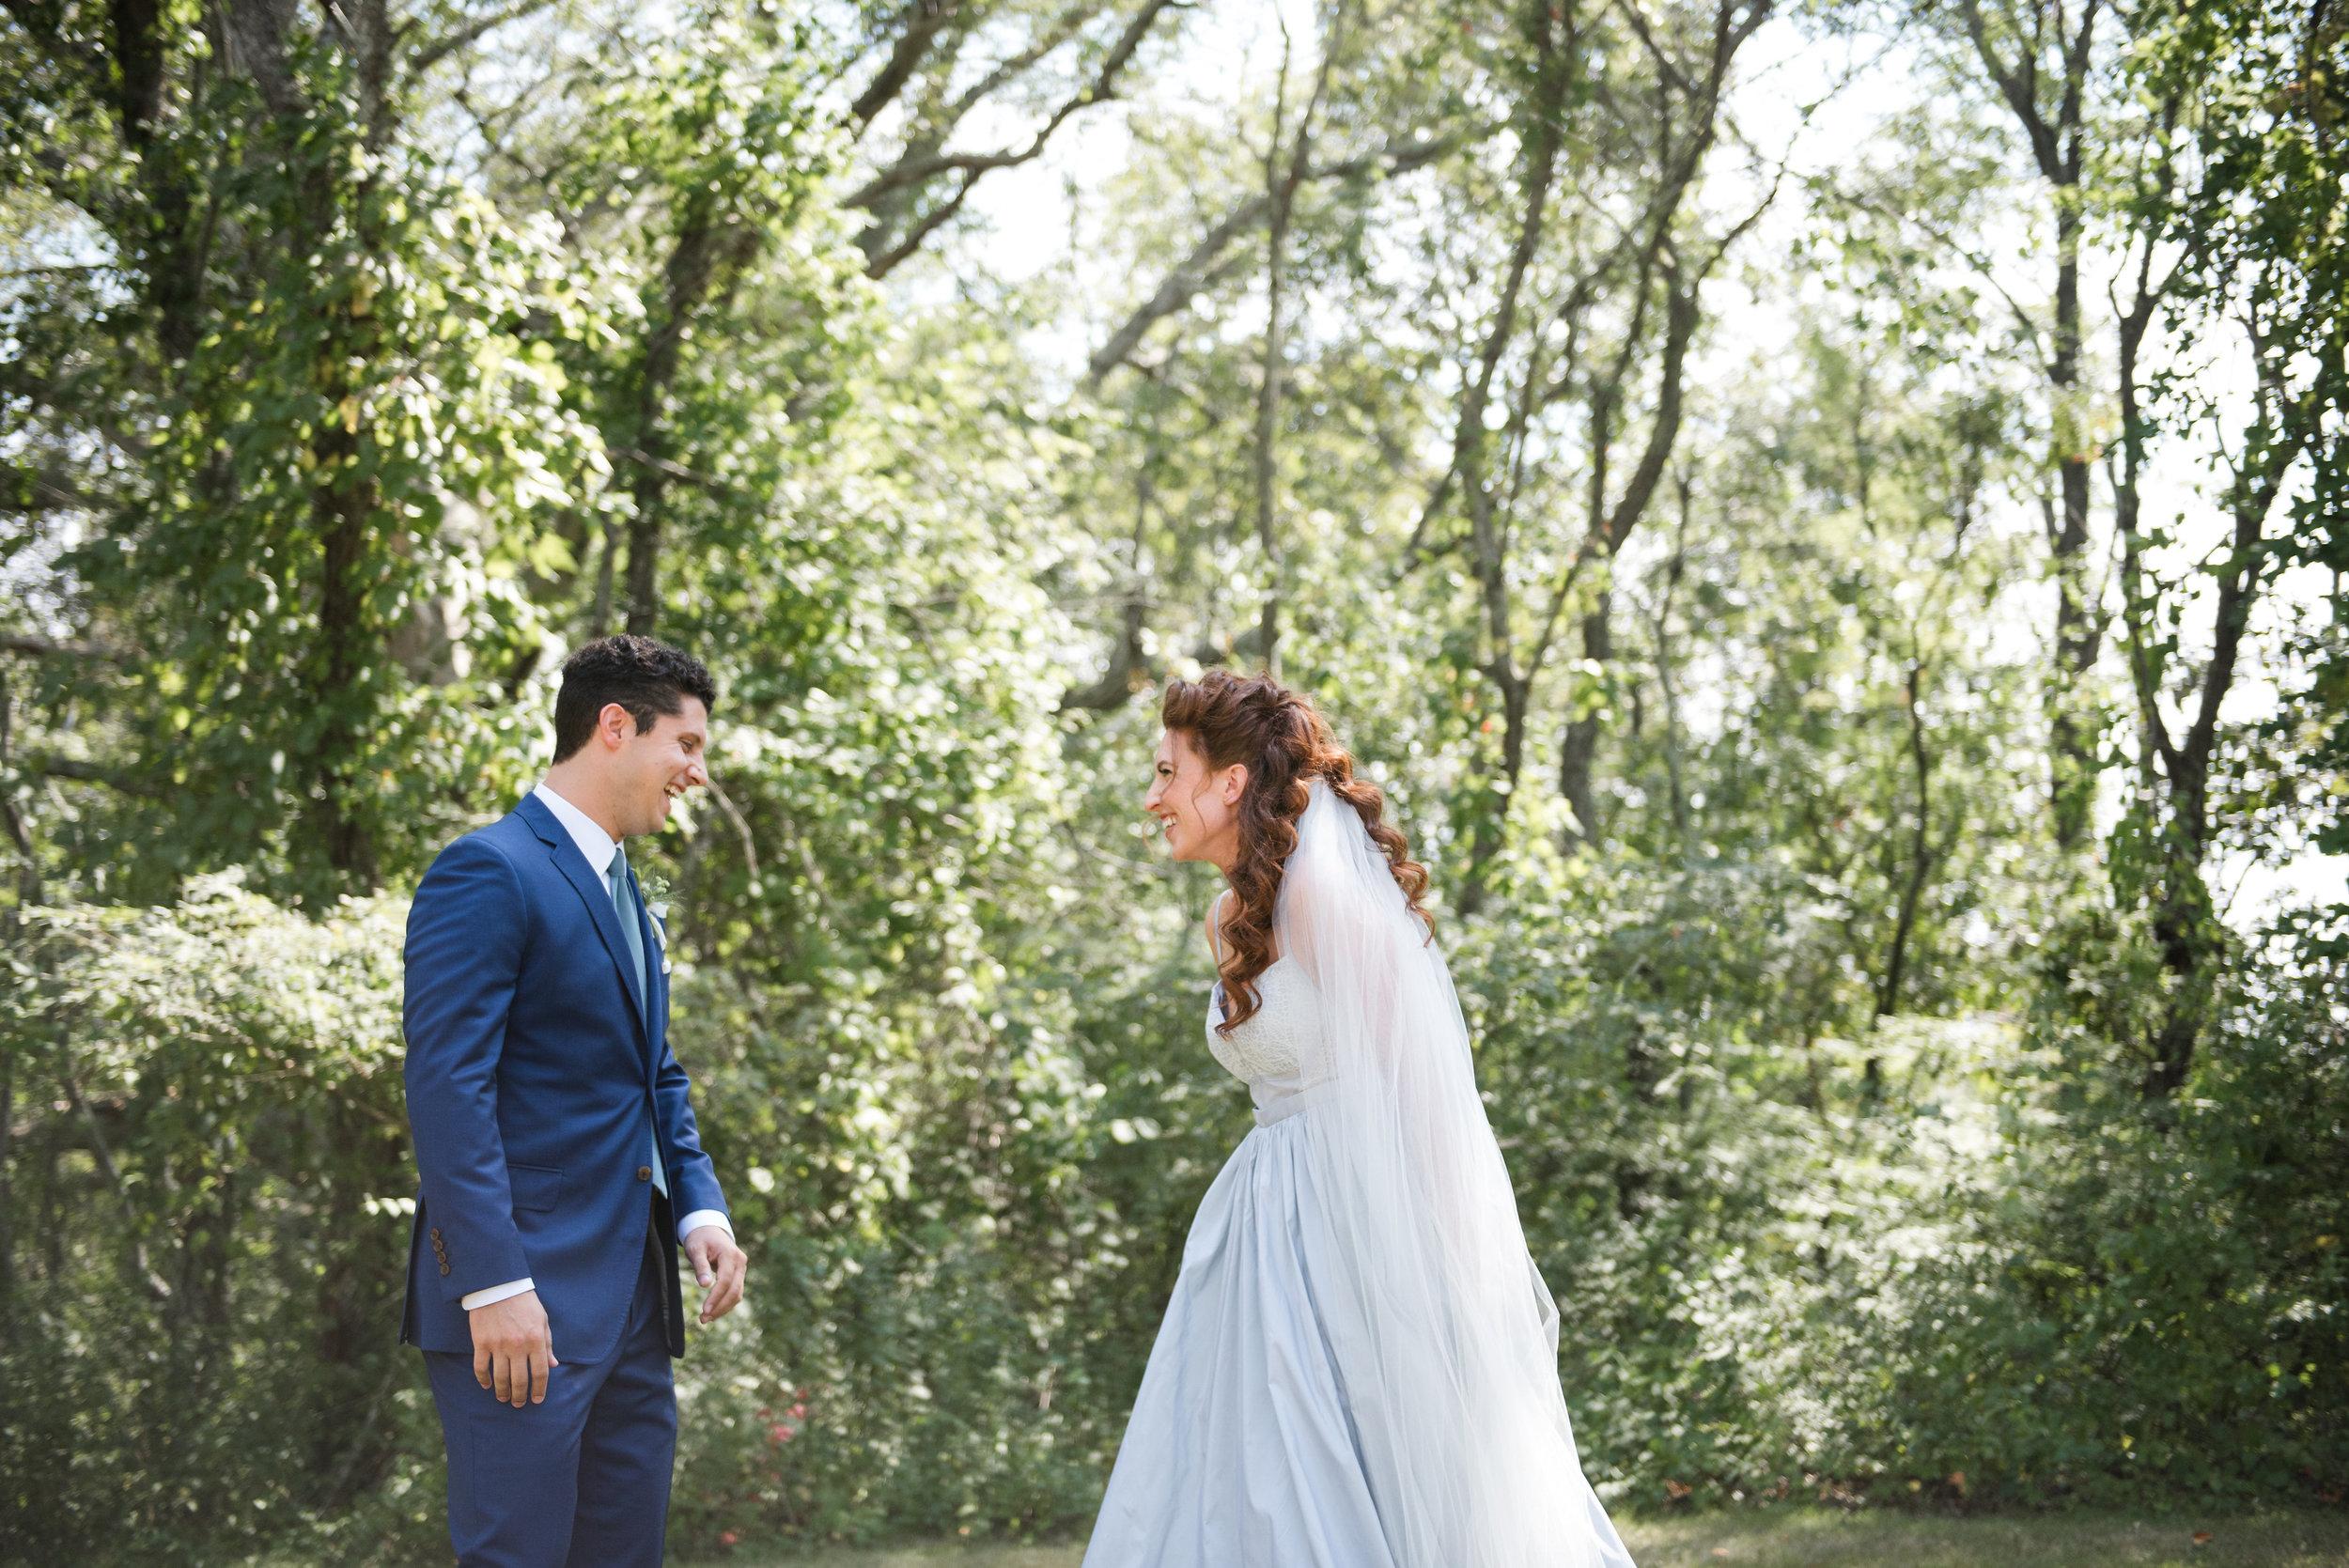 COPPER GEOMETRIC WEDDING LACE FACTORY WEDDING_035.jpg